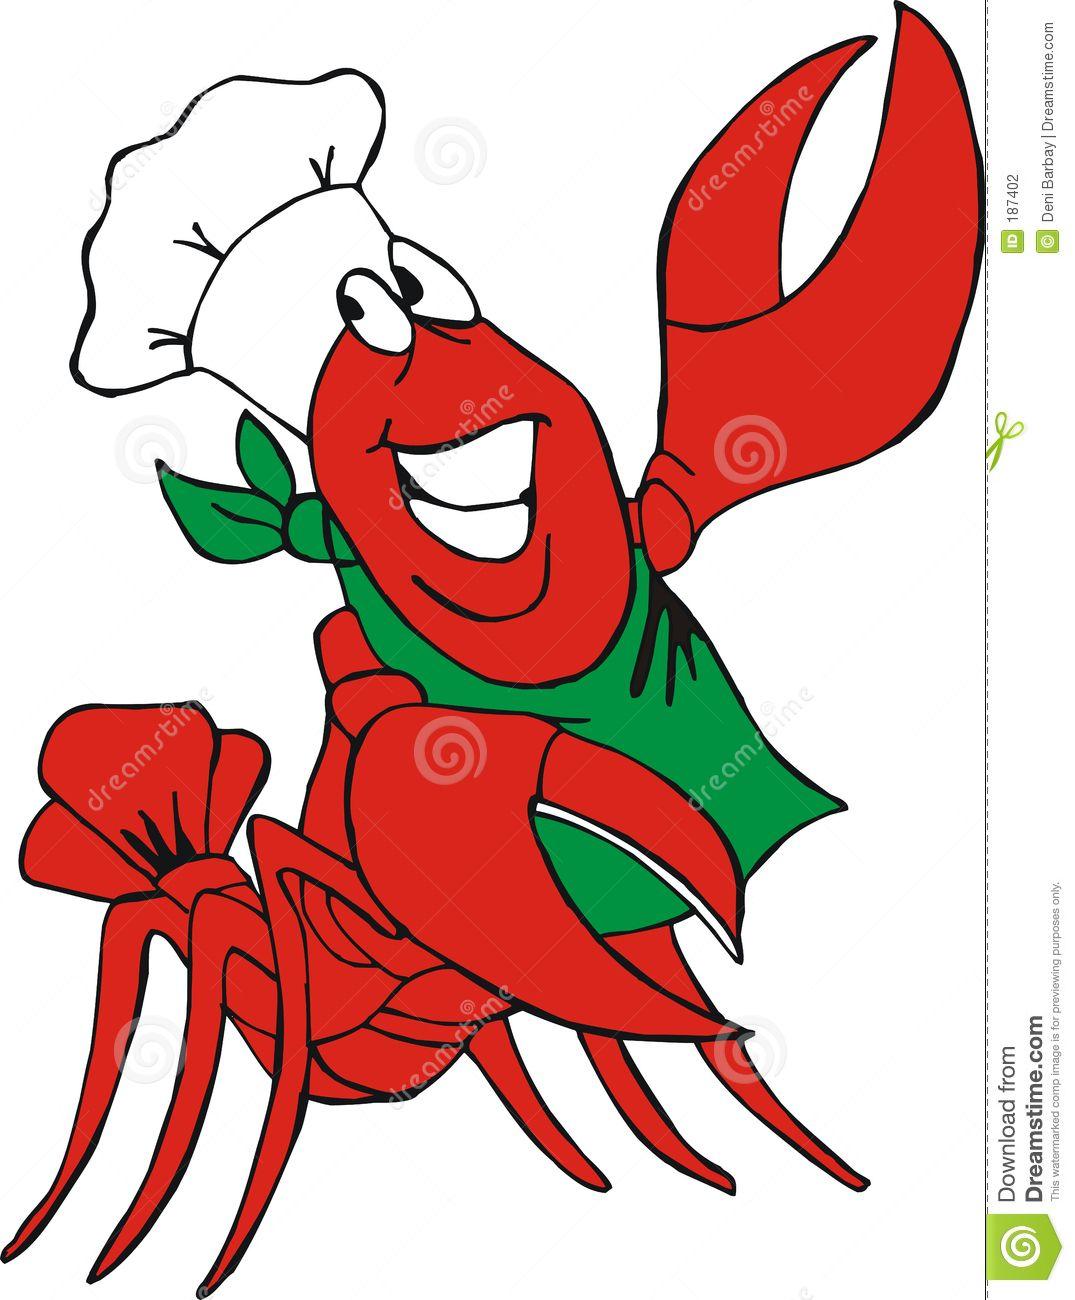 Cartoon crawfish clipart free image transparent library Cajun Crawfish Clipart | Background | Cajun crawfish, Cajun recipes ... image transparent library